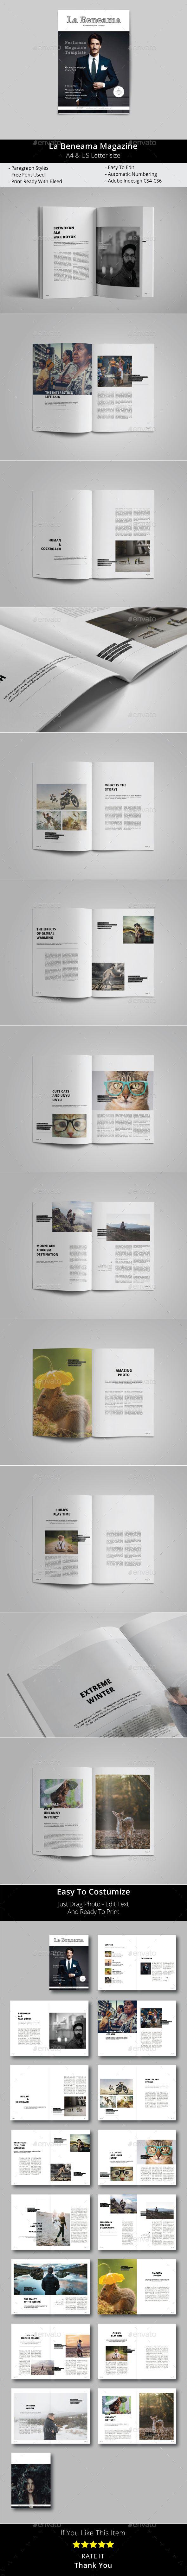 La Beneama Magazine  — InDesign Template #online magazines #magazine cover template • Download ➝ https://graphicriver.net/item/la-beneama-magazine/18135514?ref=pxcr